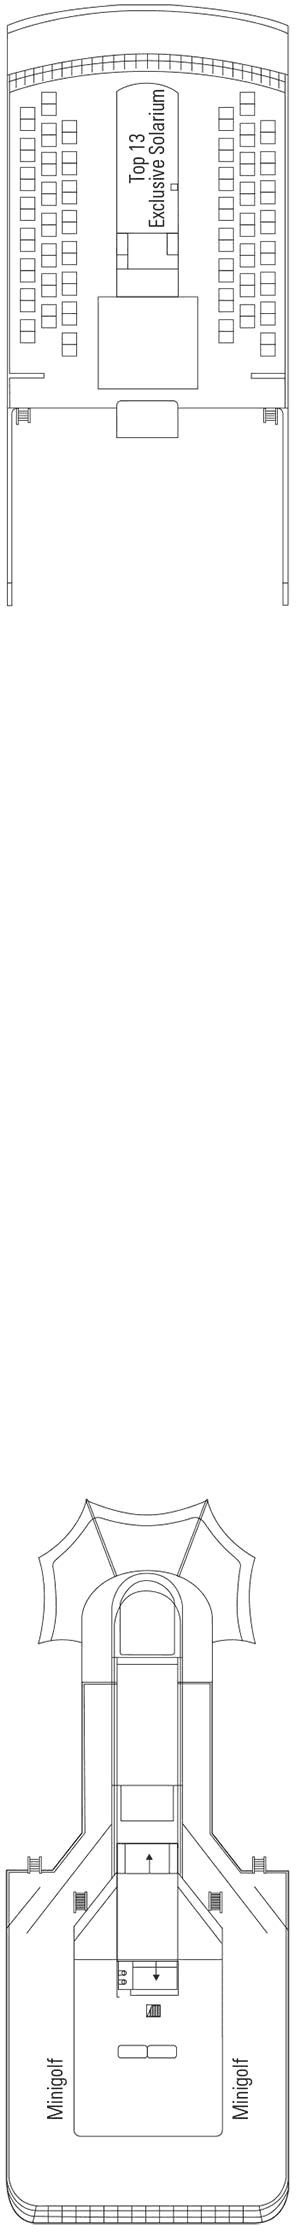 MSC Opera - Sun Deck / Minigolf